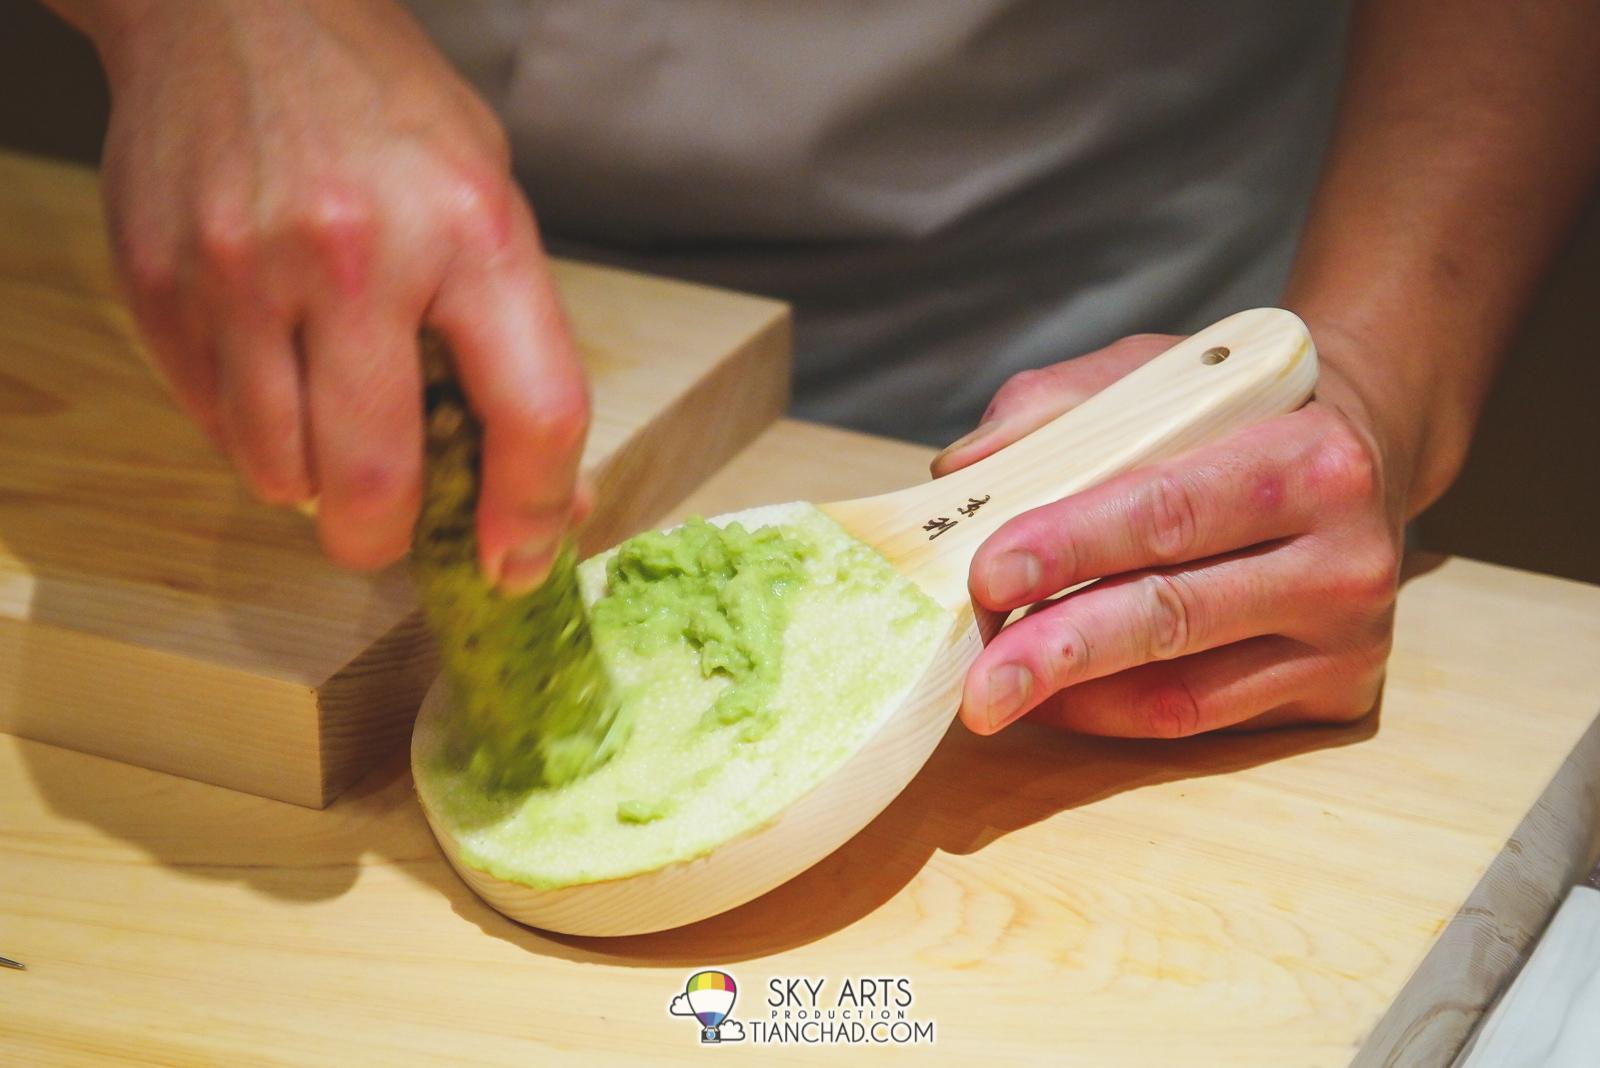 Fresh wasabi in the making